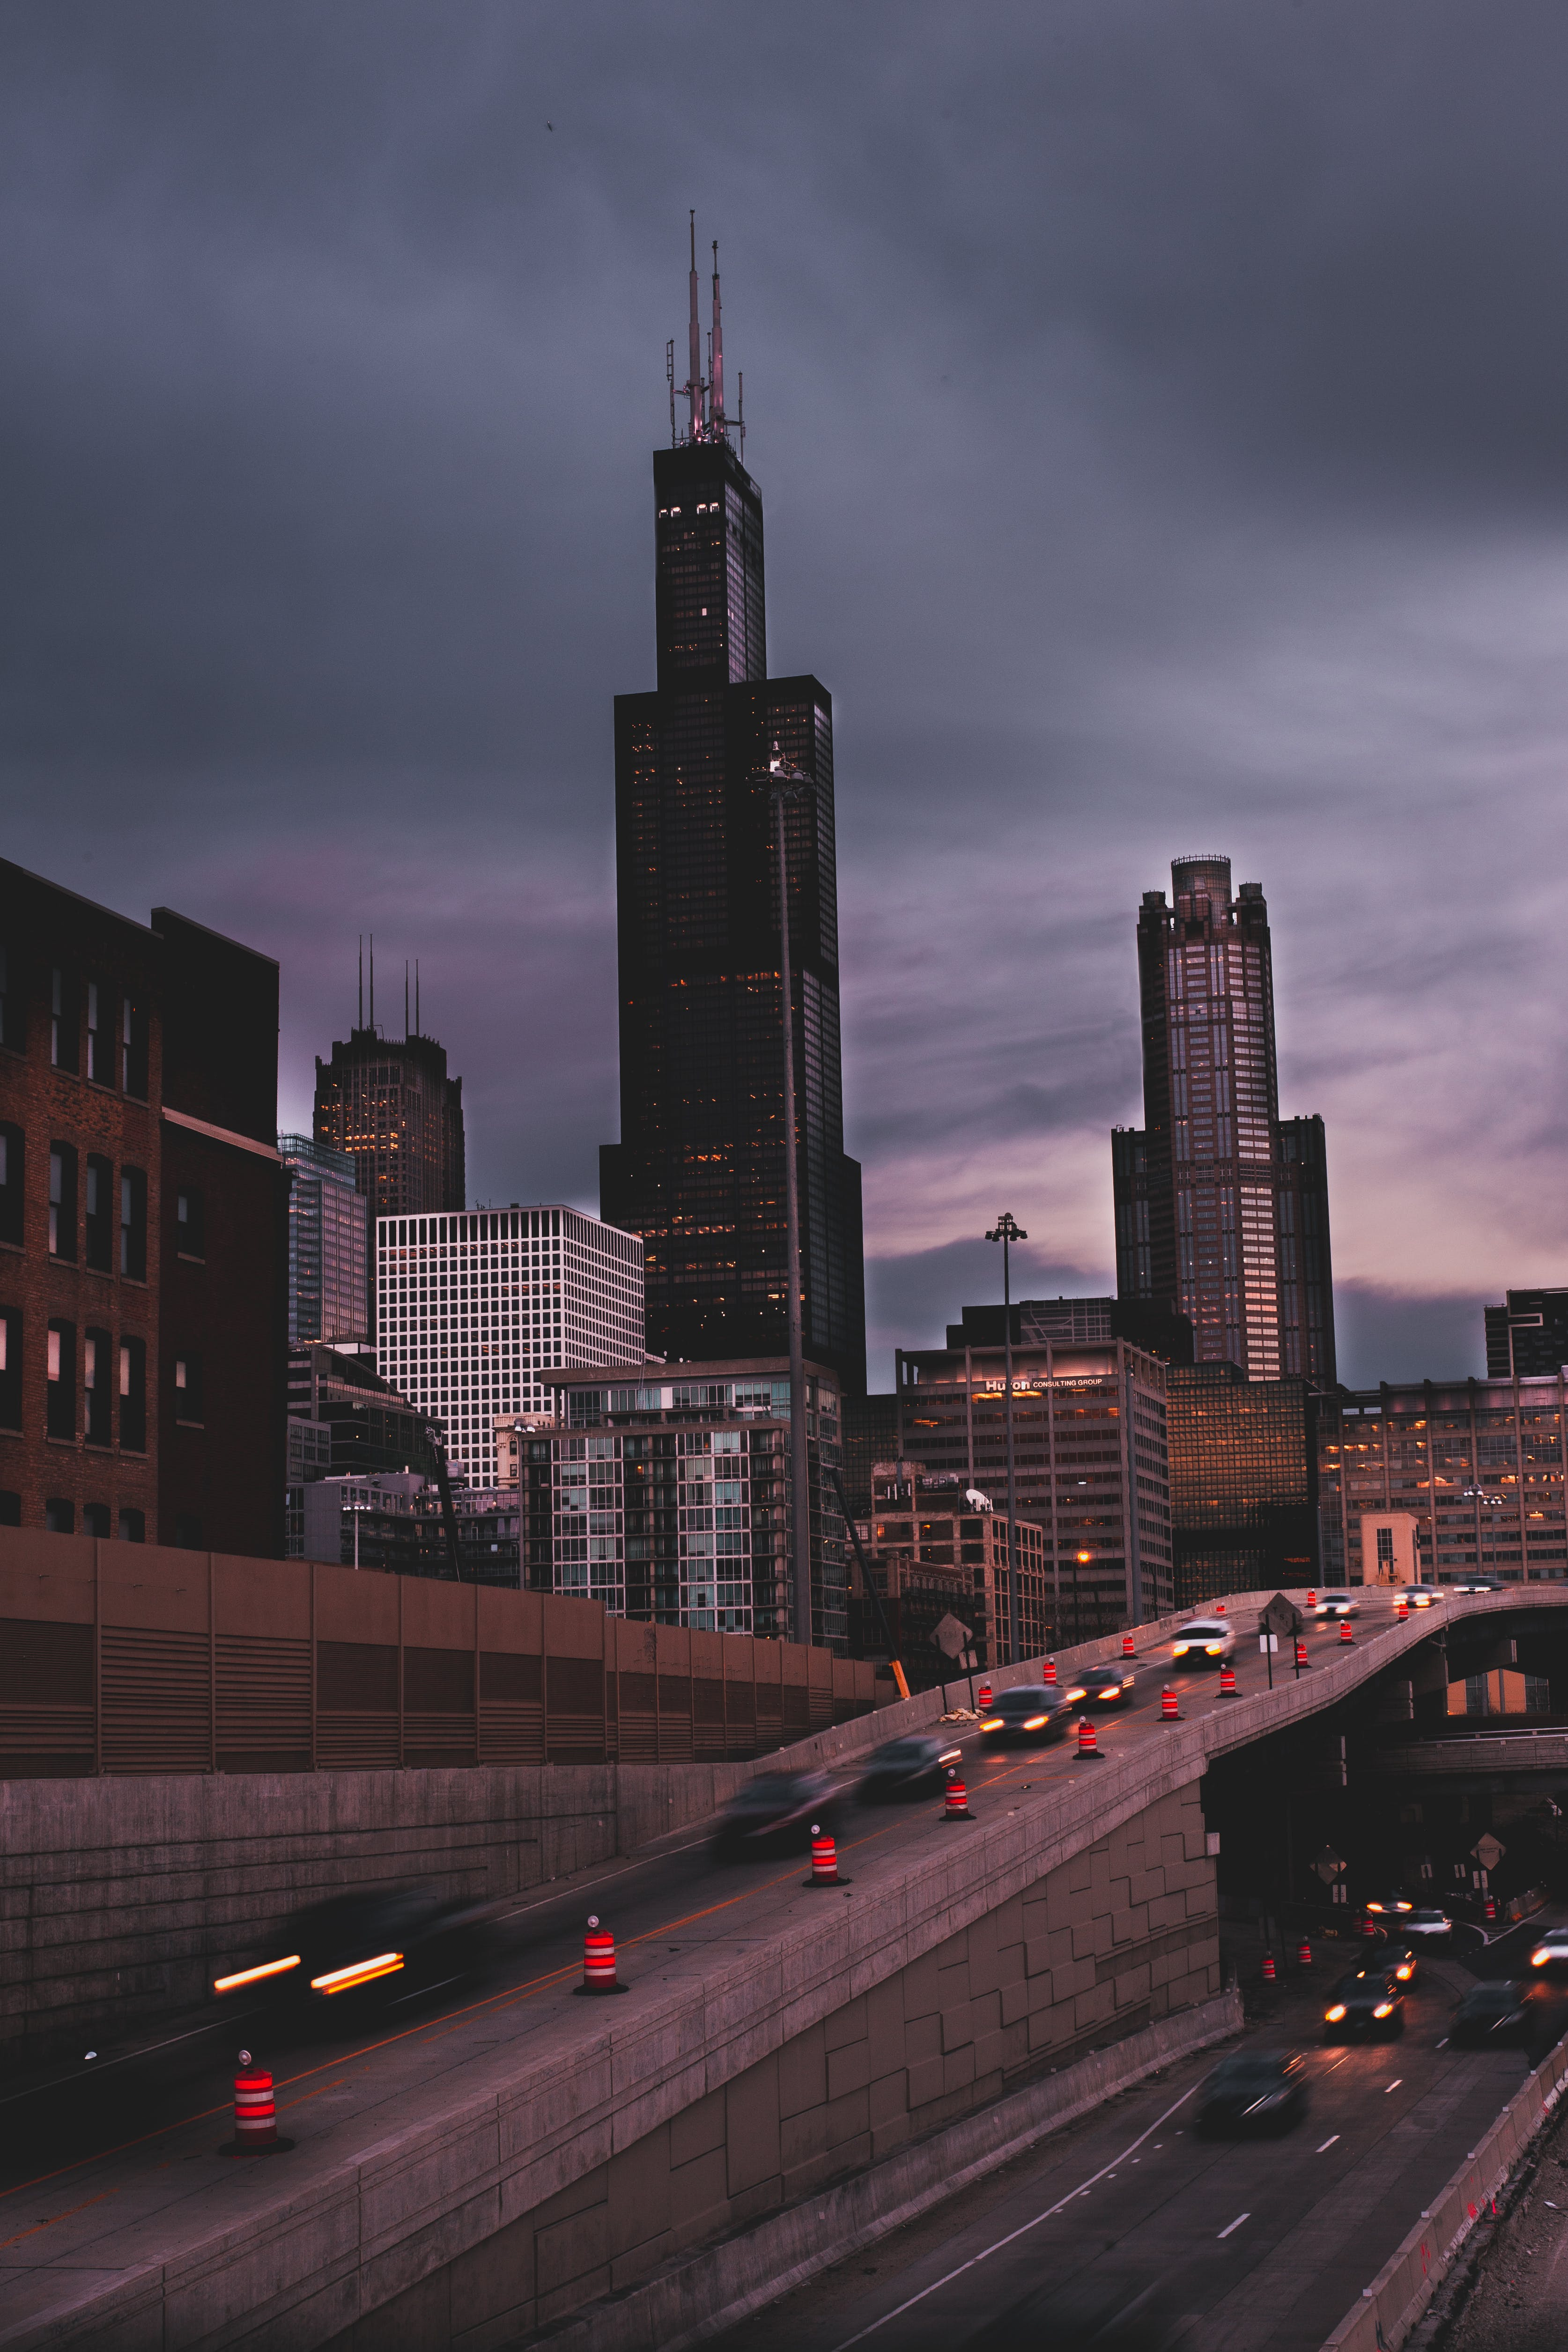 Concrete Buildings Under Gray Sky